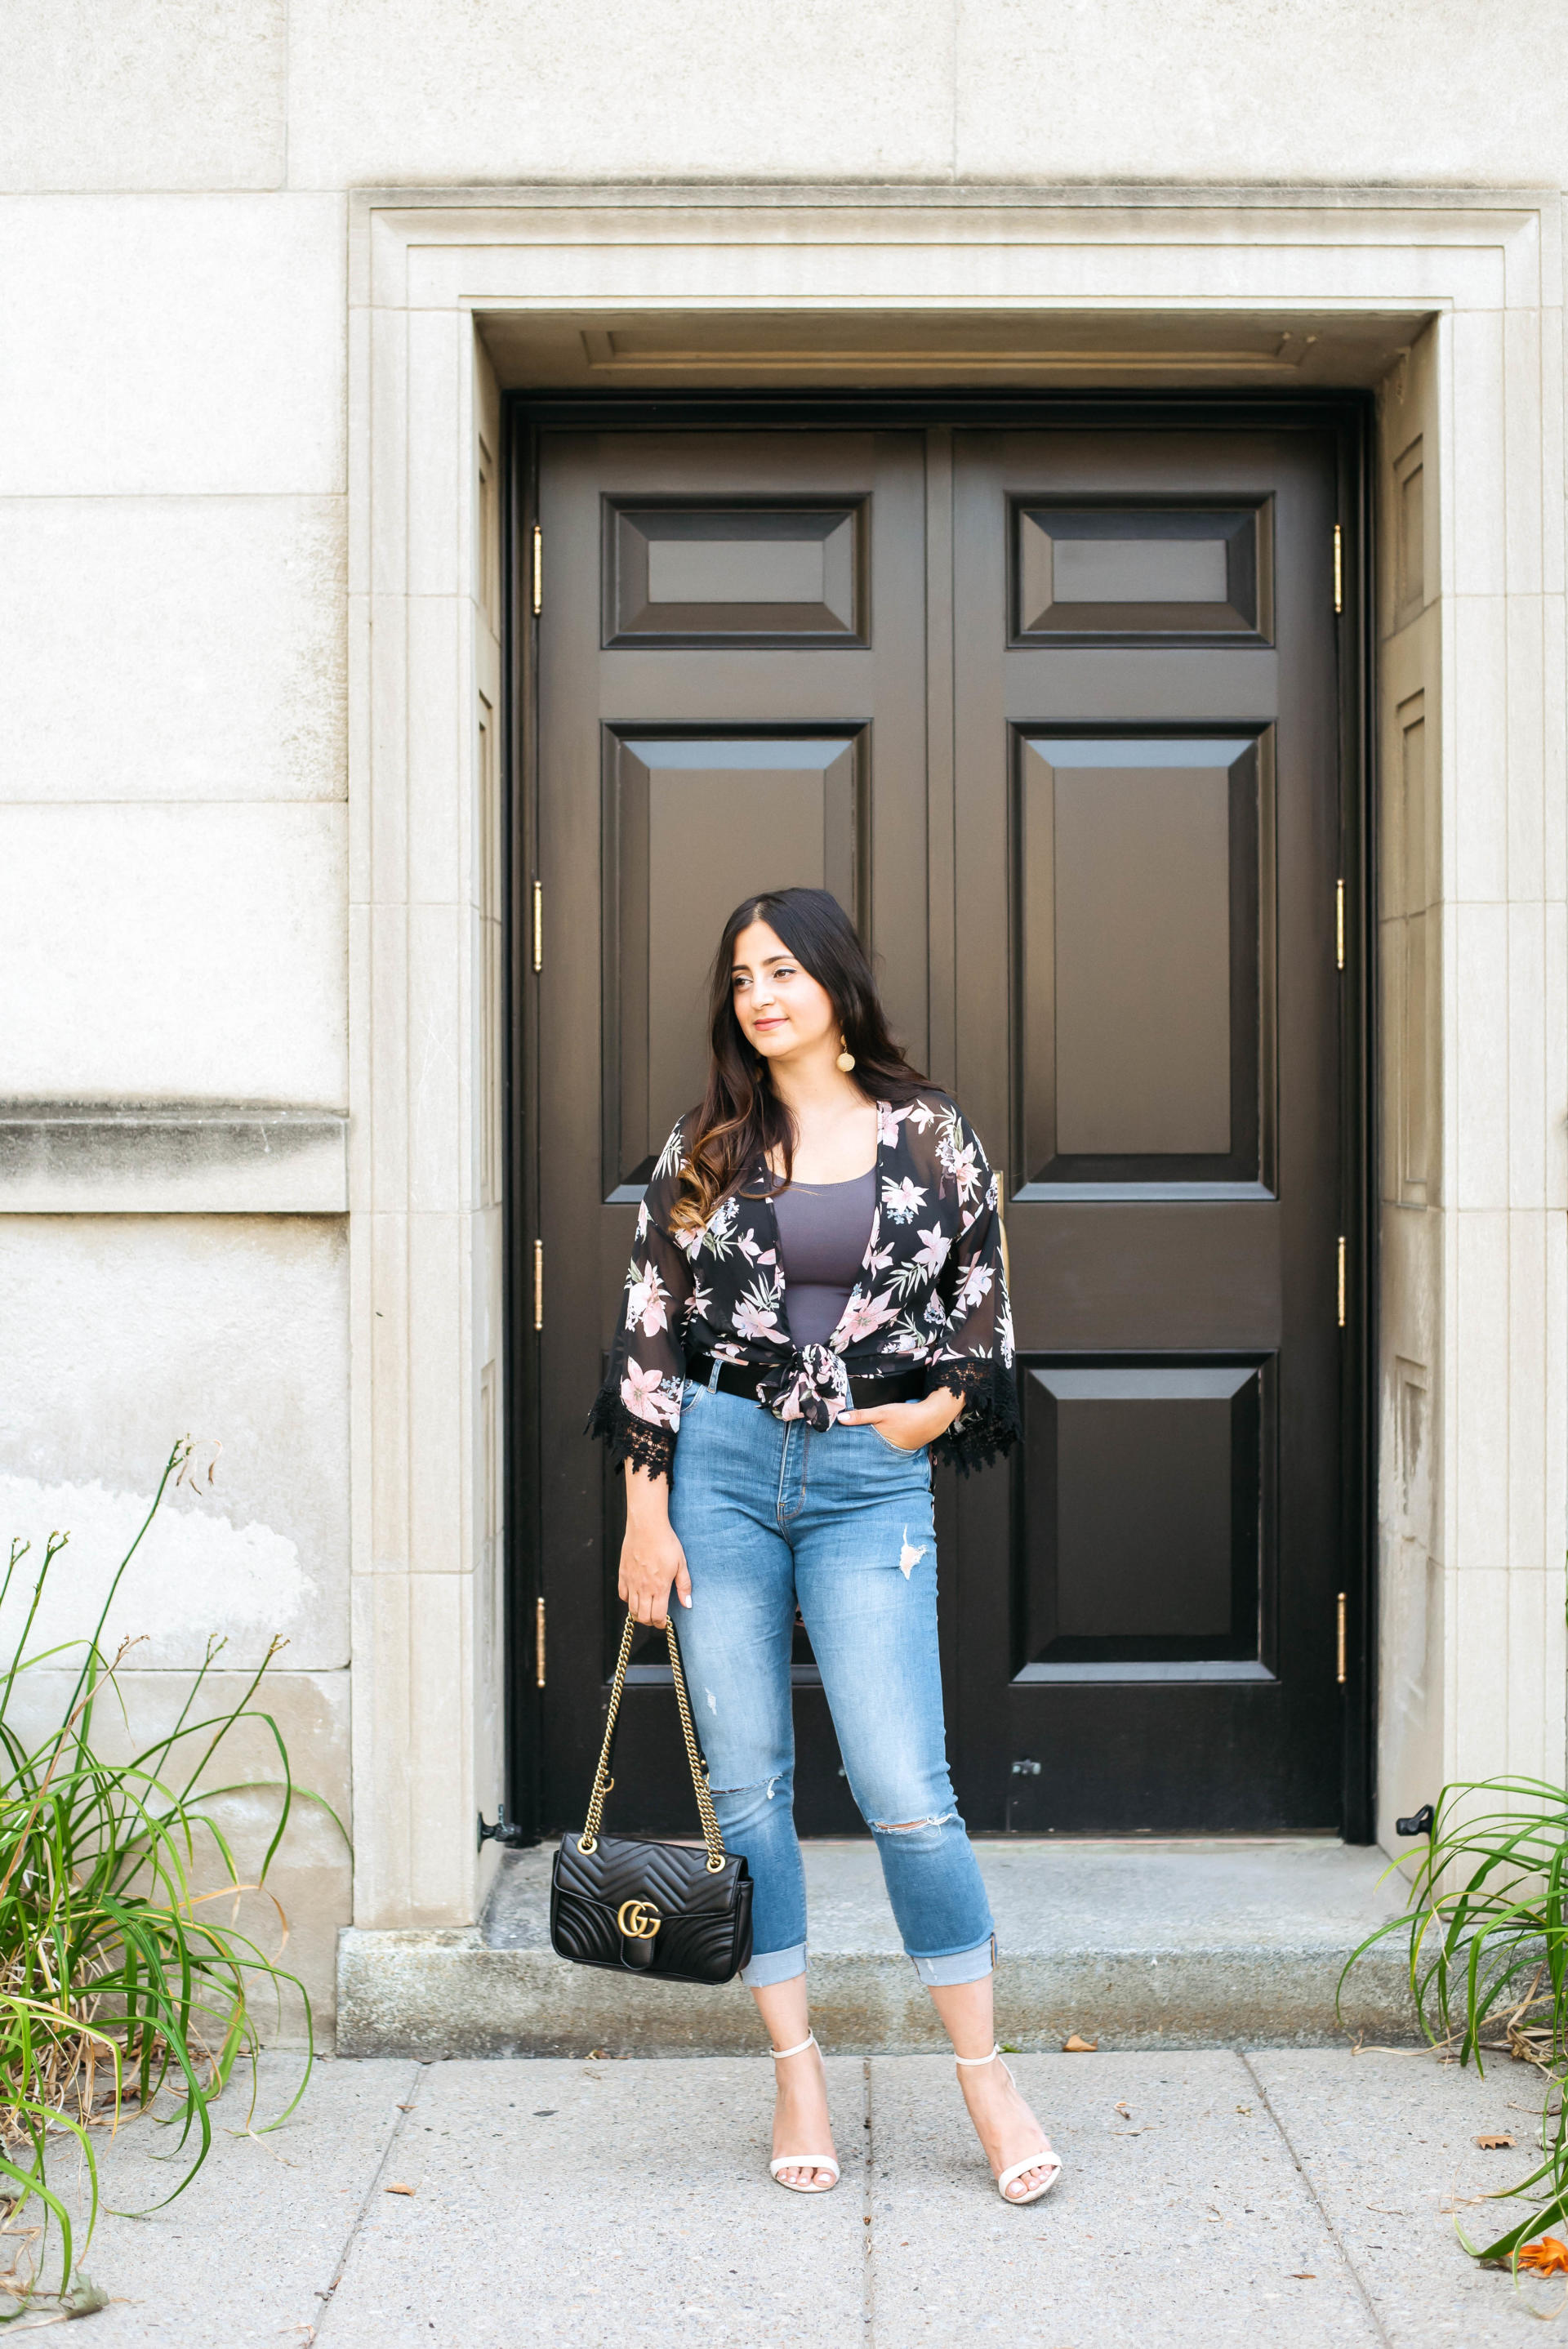 Black Floral Kimono | Gucci Marmont Bag